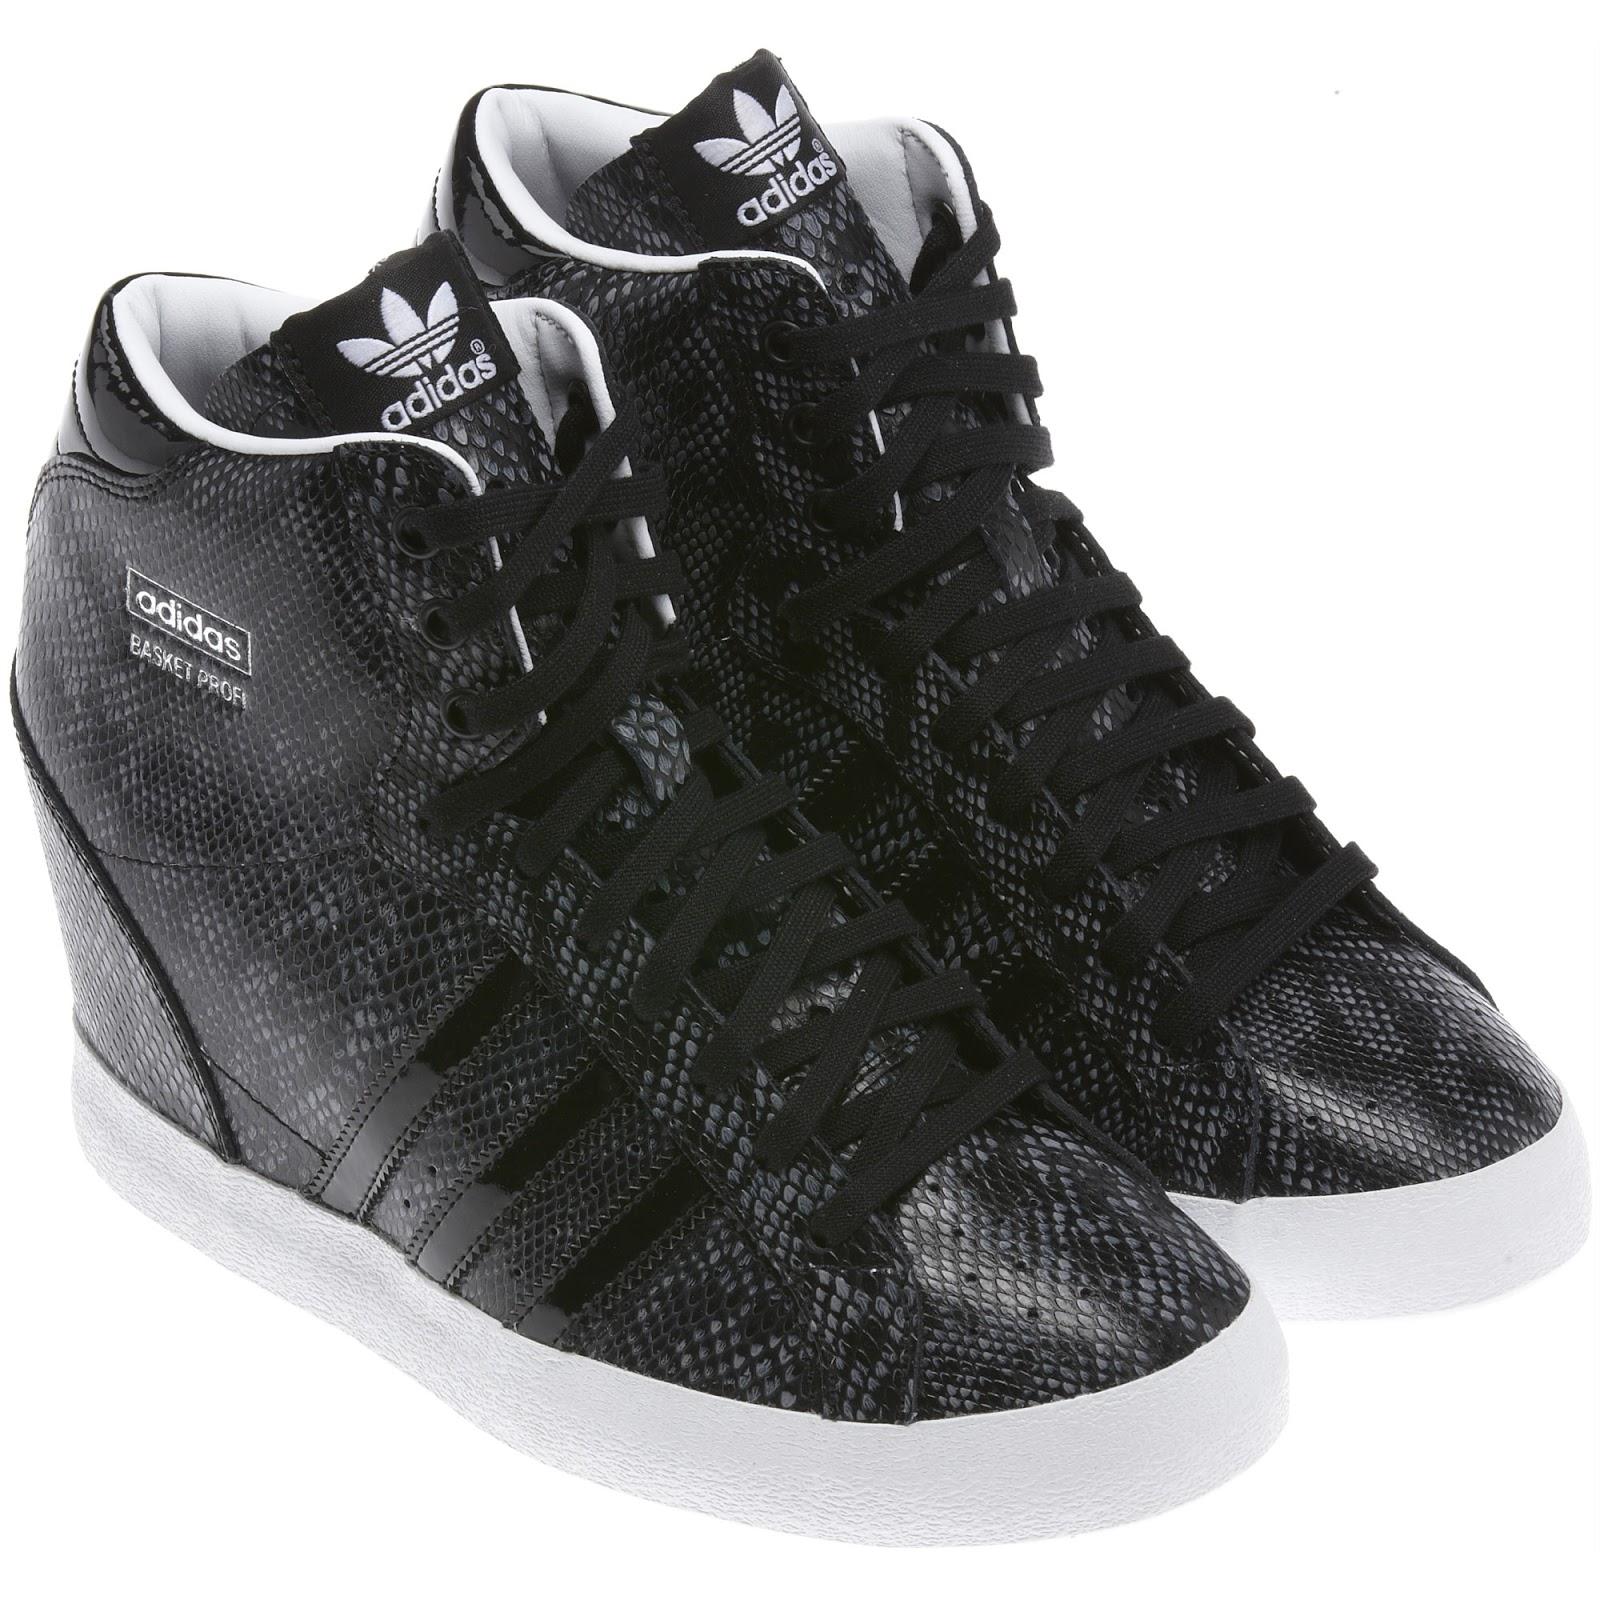 b7a15288e6b2 Adidas Wedge-Heeled Sneakers - cars   life